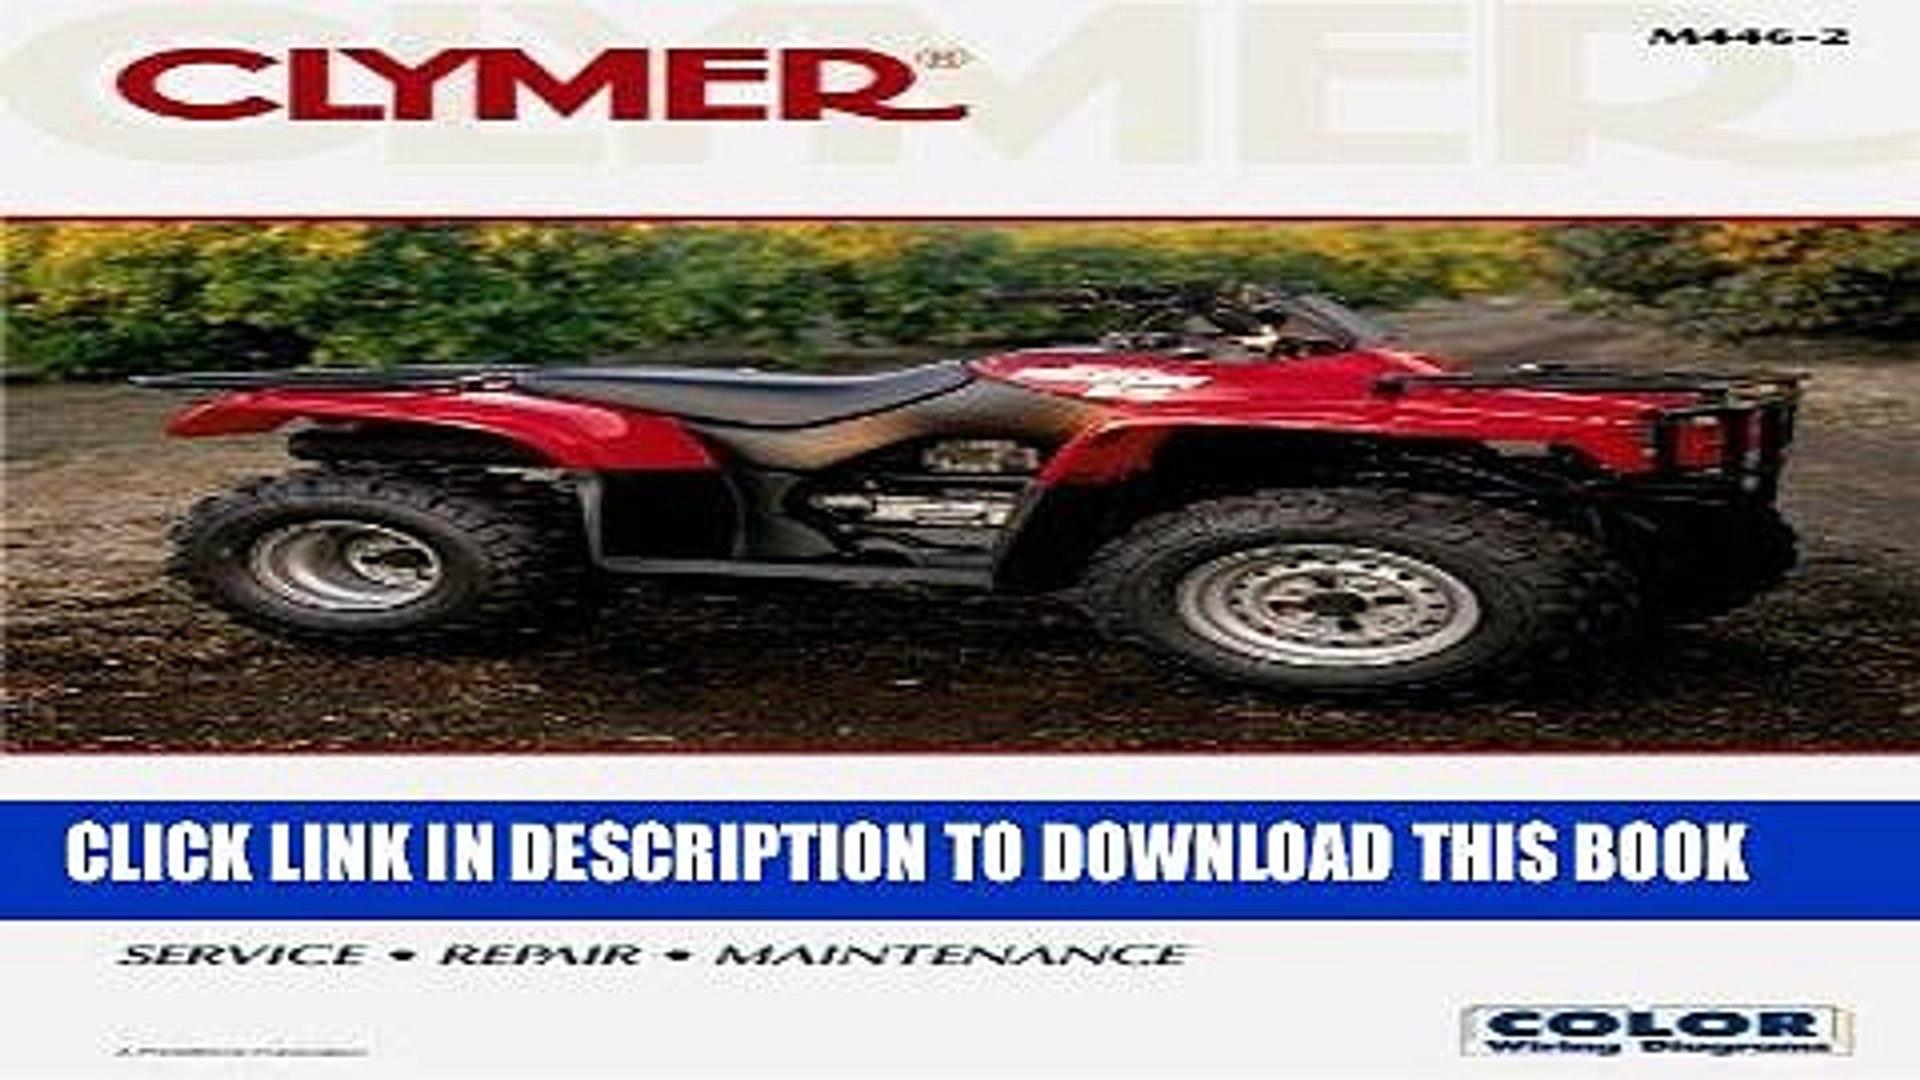 Starter Honda TRX250 TRX 250 Recon 229cc 1997 1998 1999 2000 2001 ATV New